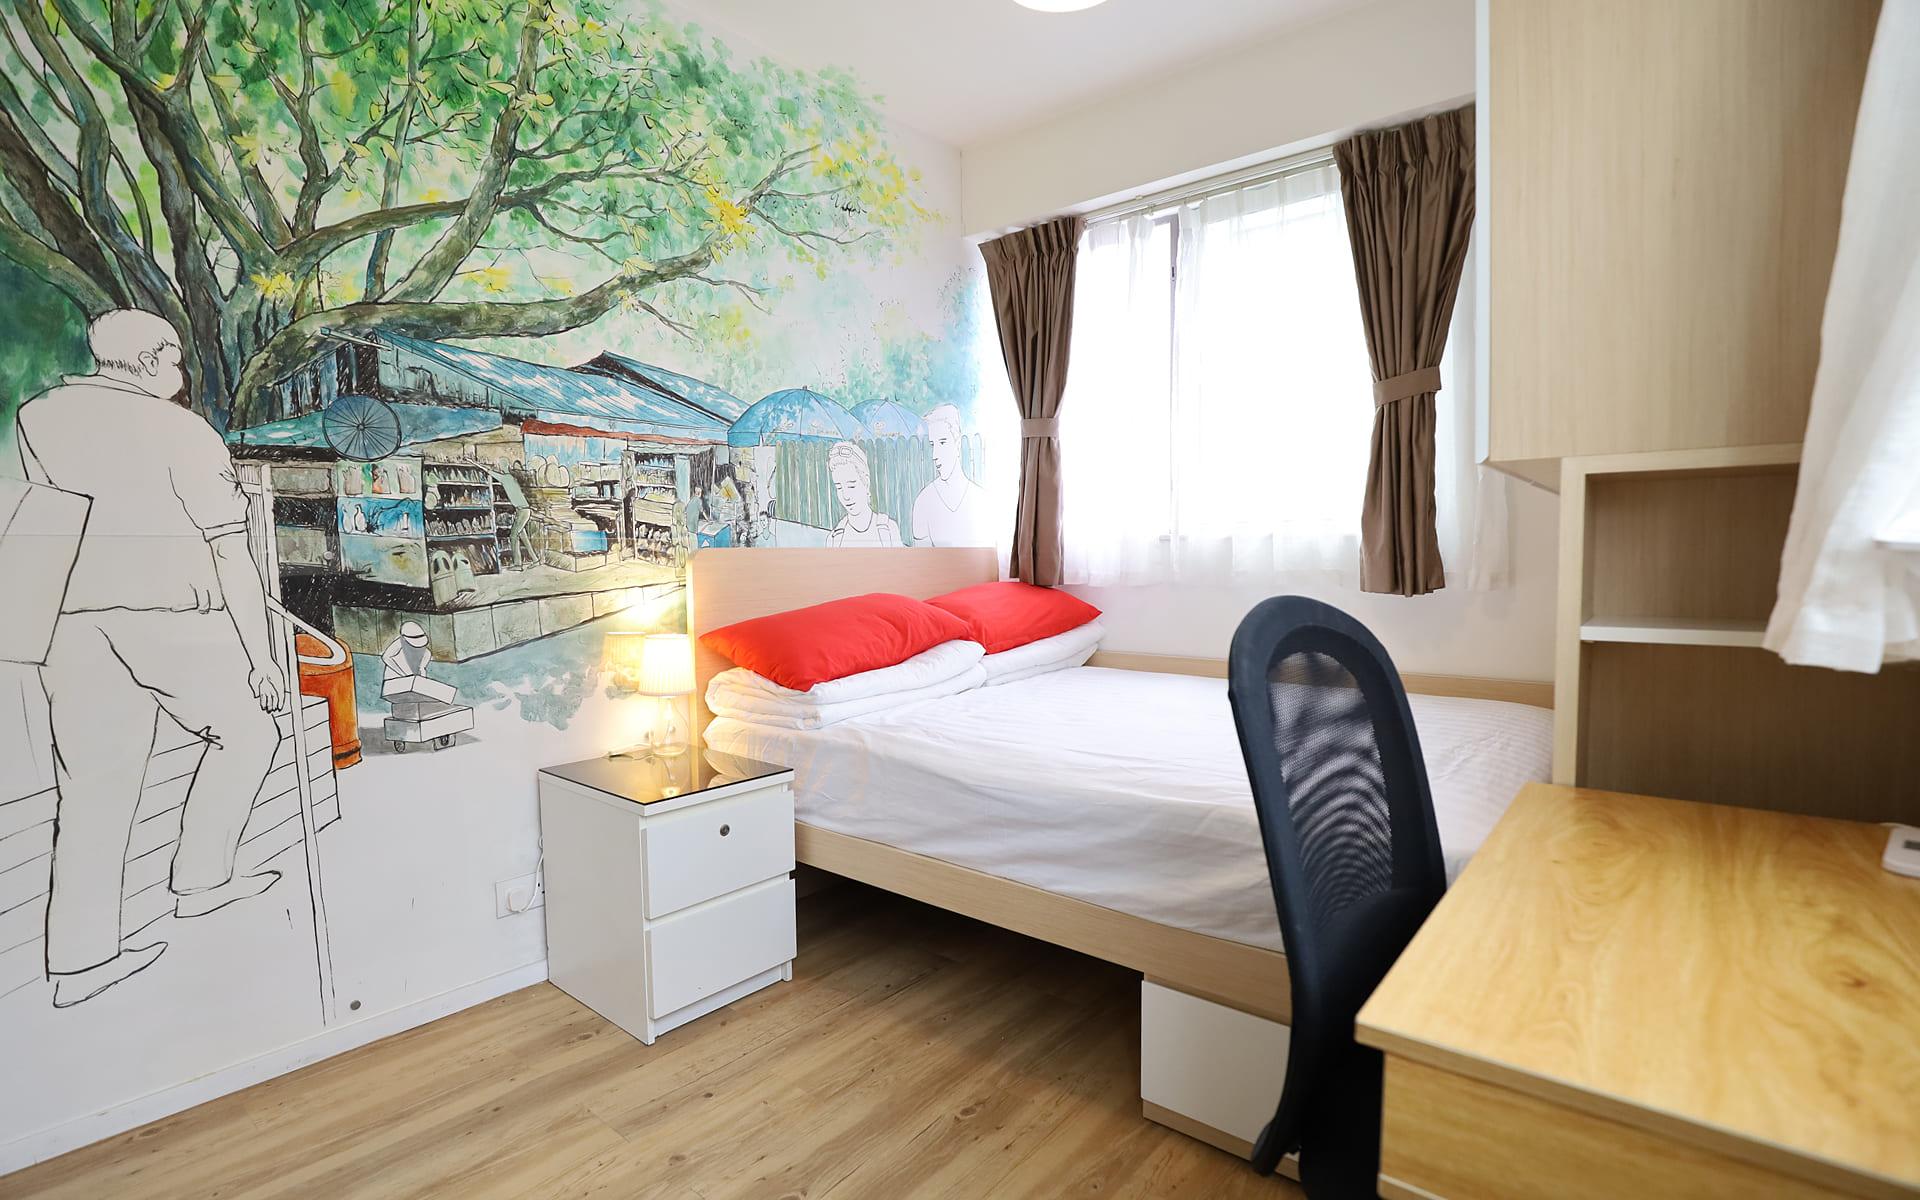 hk_service_apartment_15909835071596694985.jpg